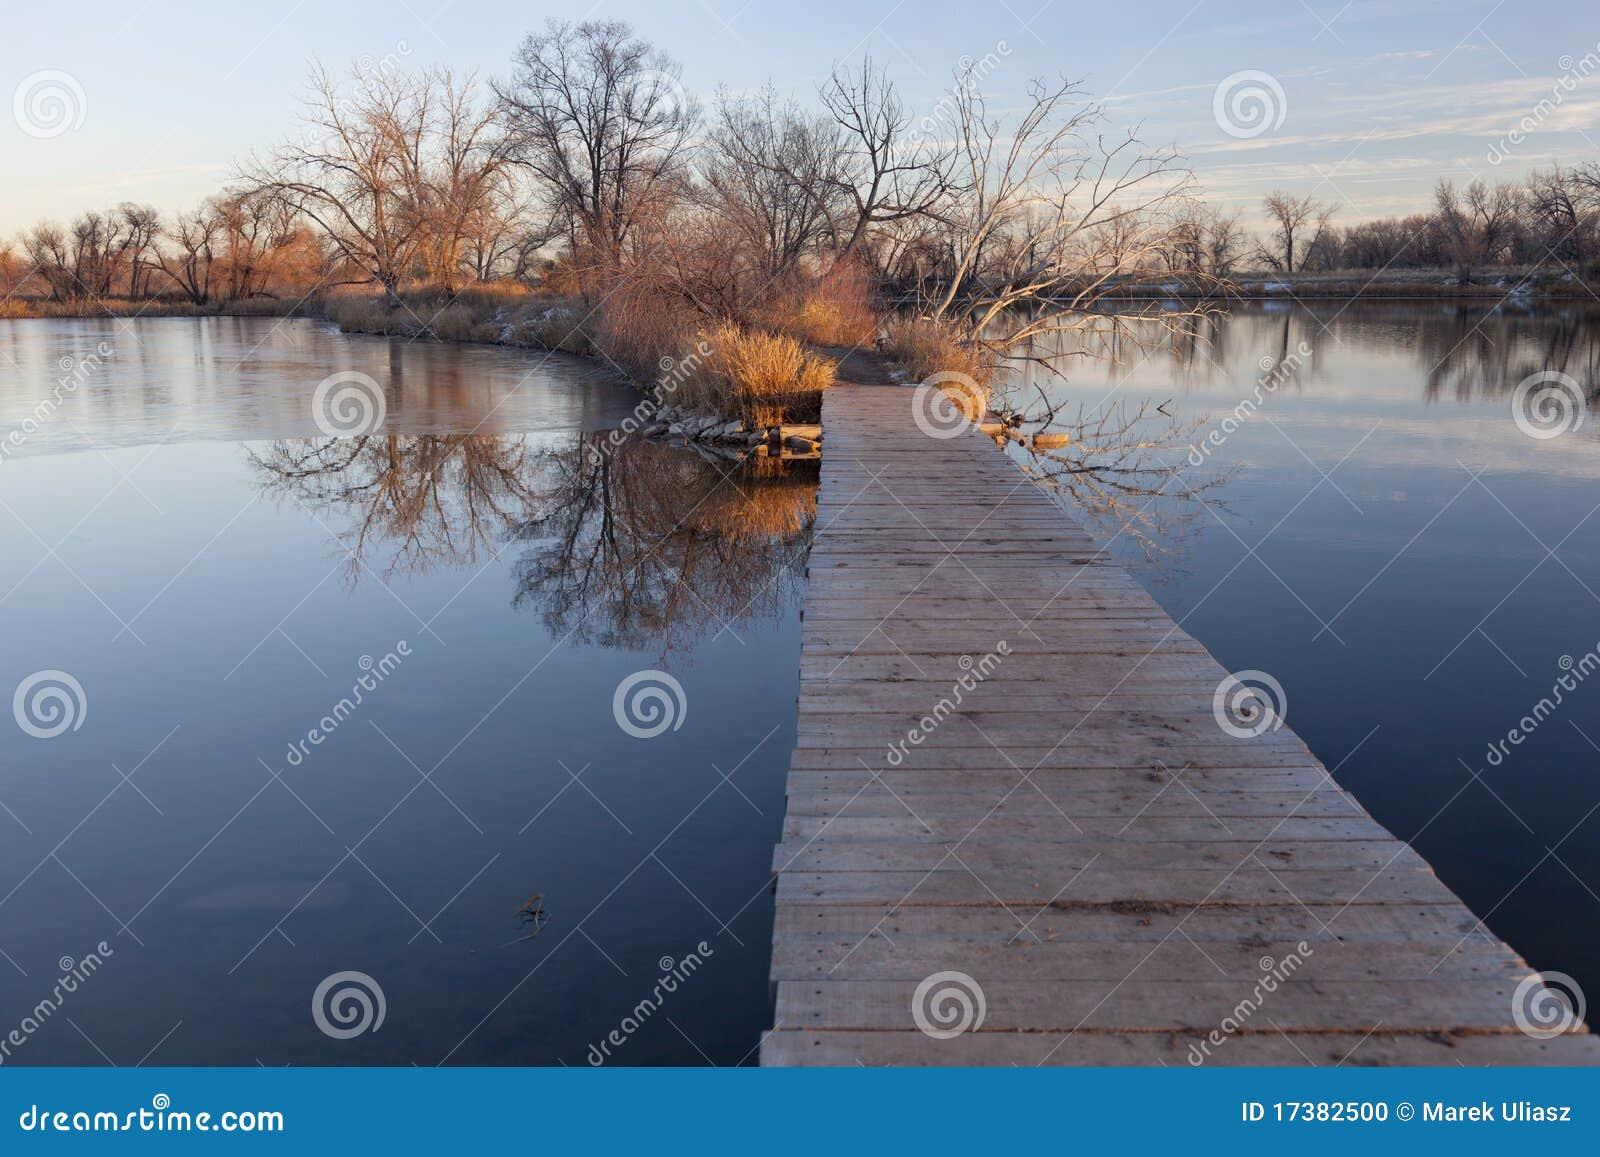 Boardwalk pathway over lake